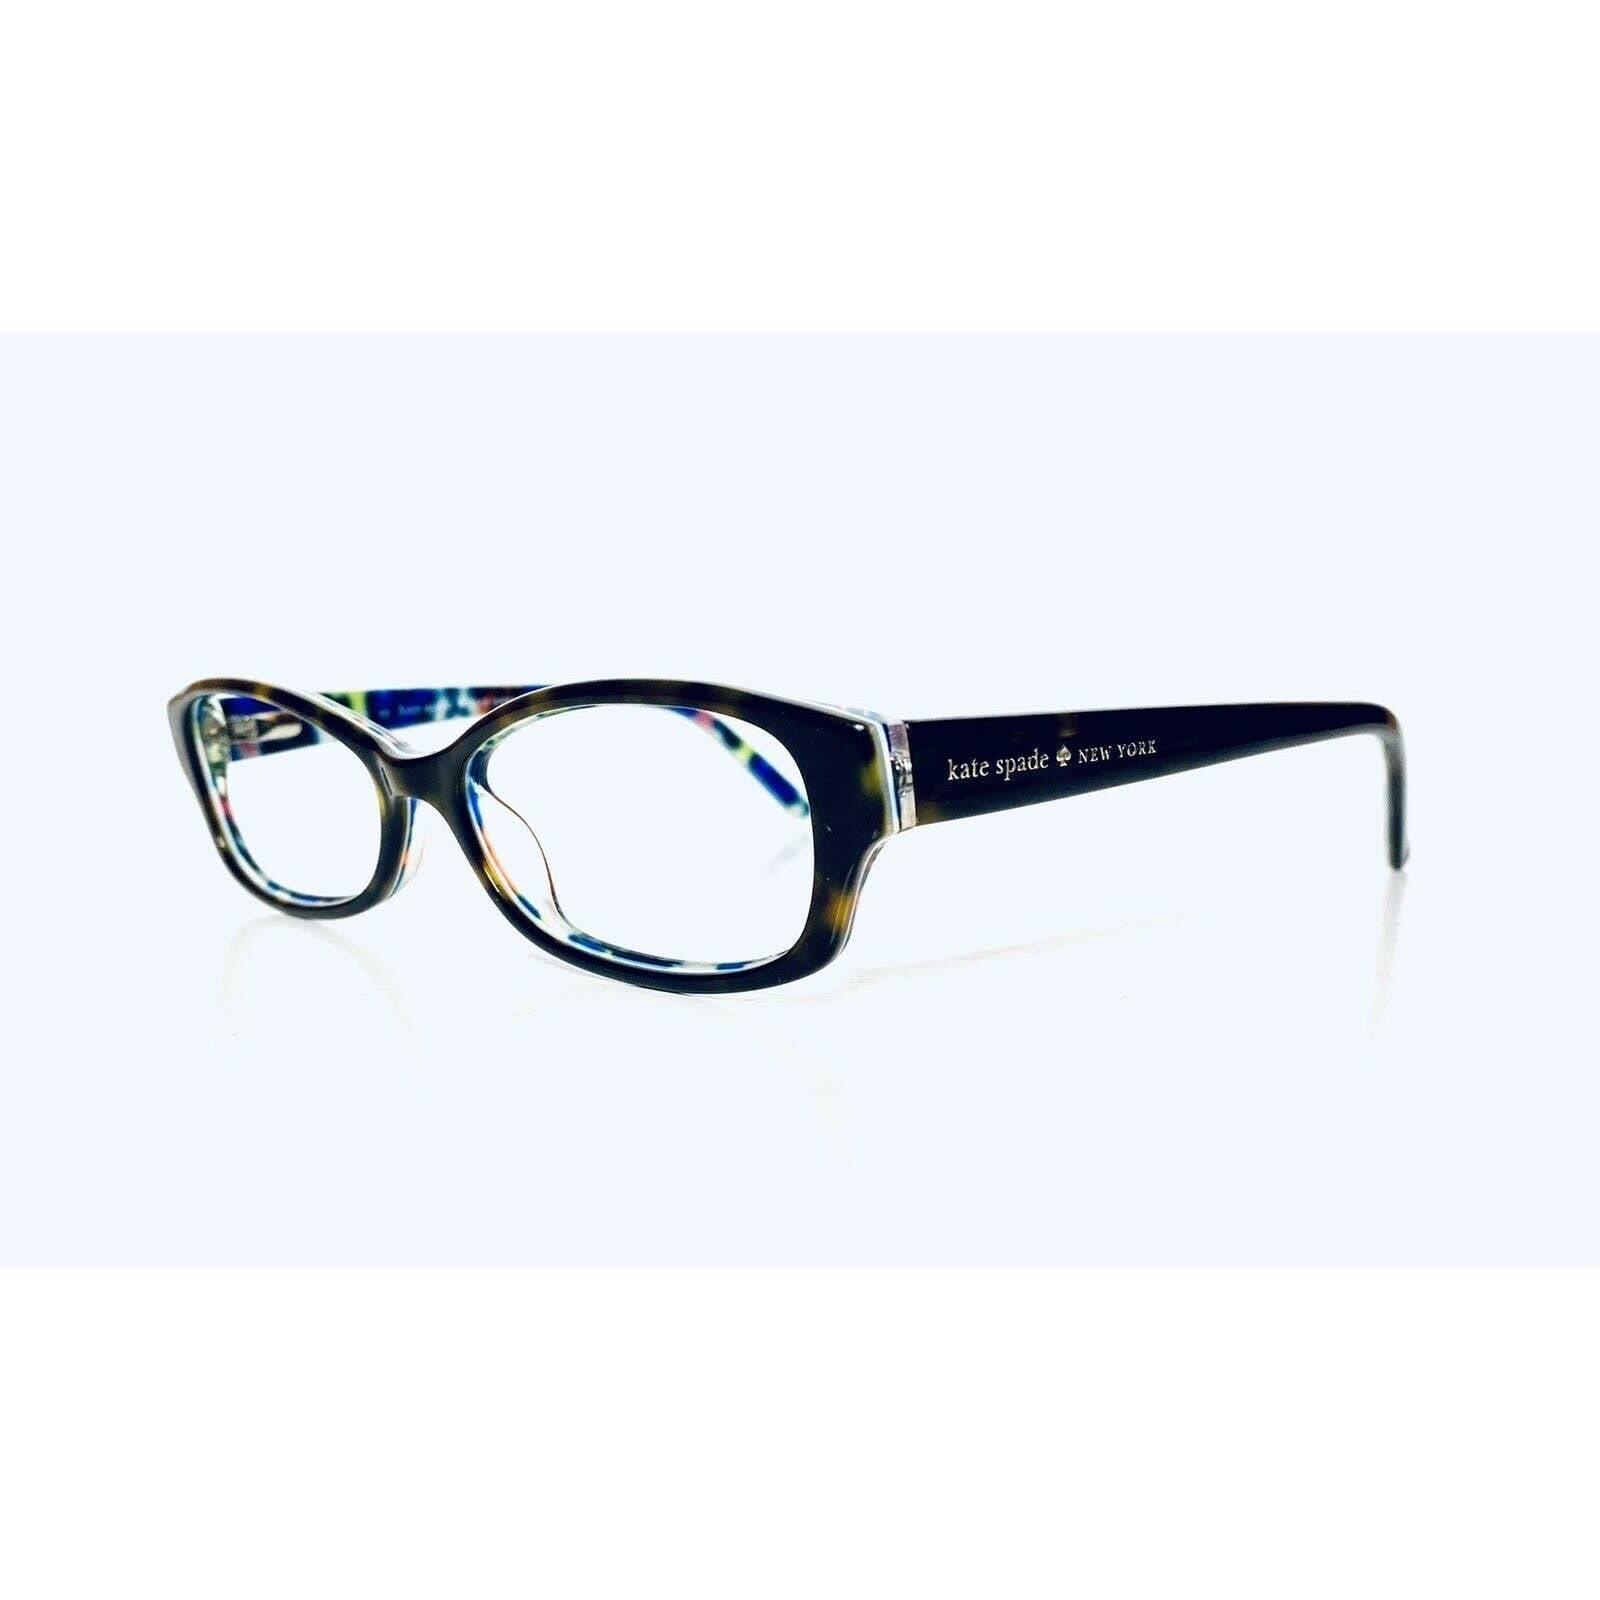 Kate Spade NY Tortoise Glasses